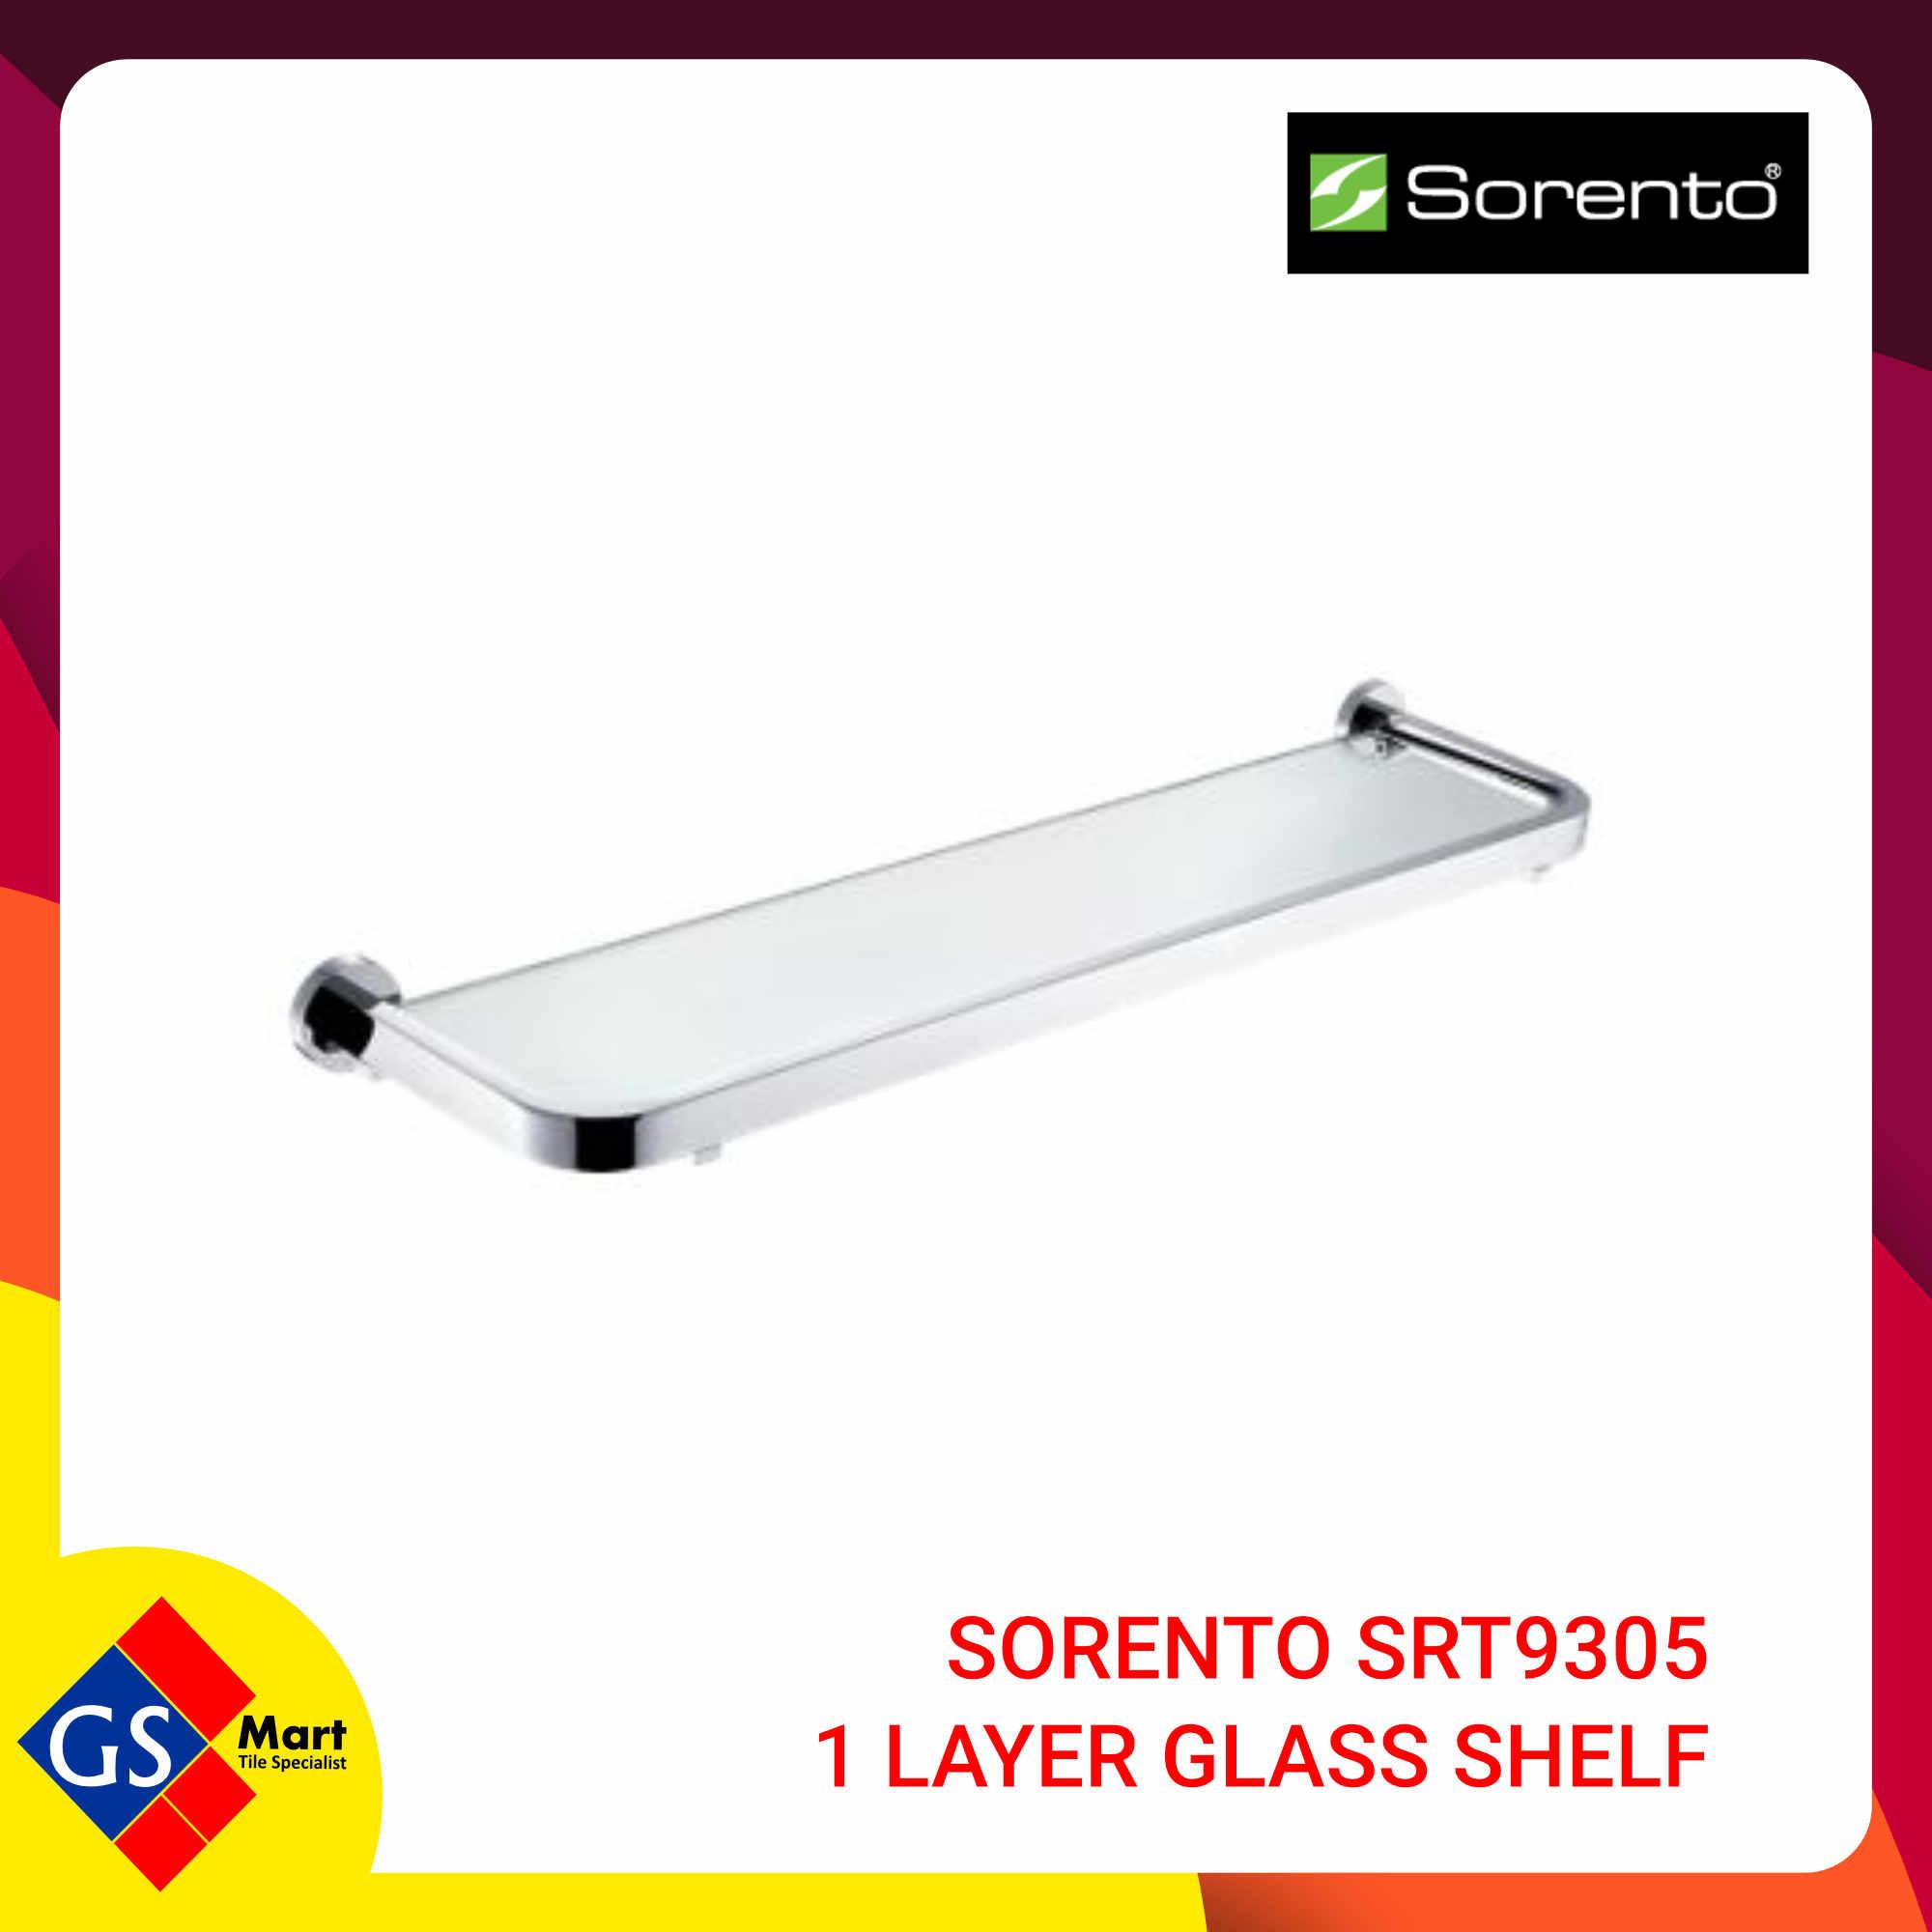 SORENTO SRT9305 1 LAYER GLASS SHELF